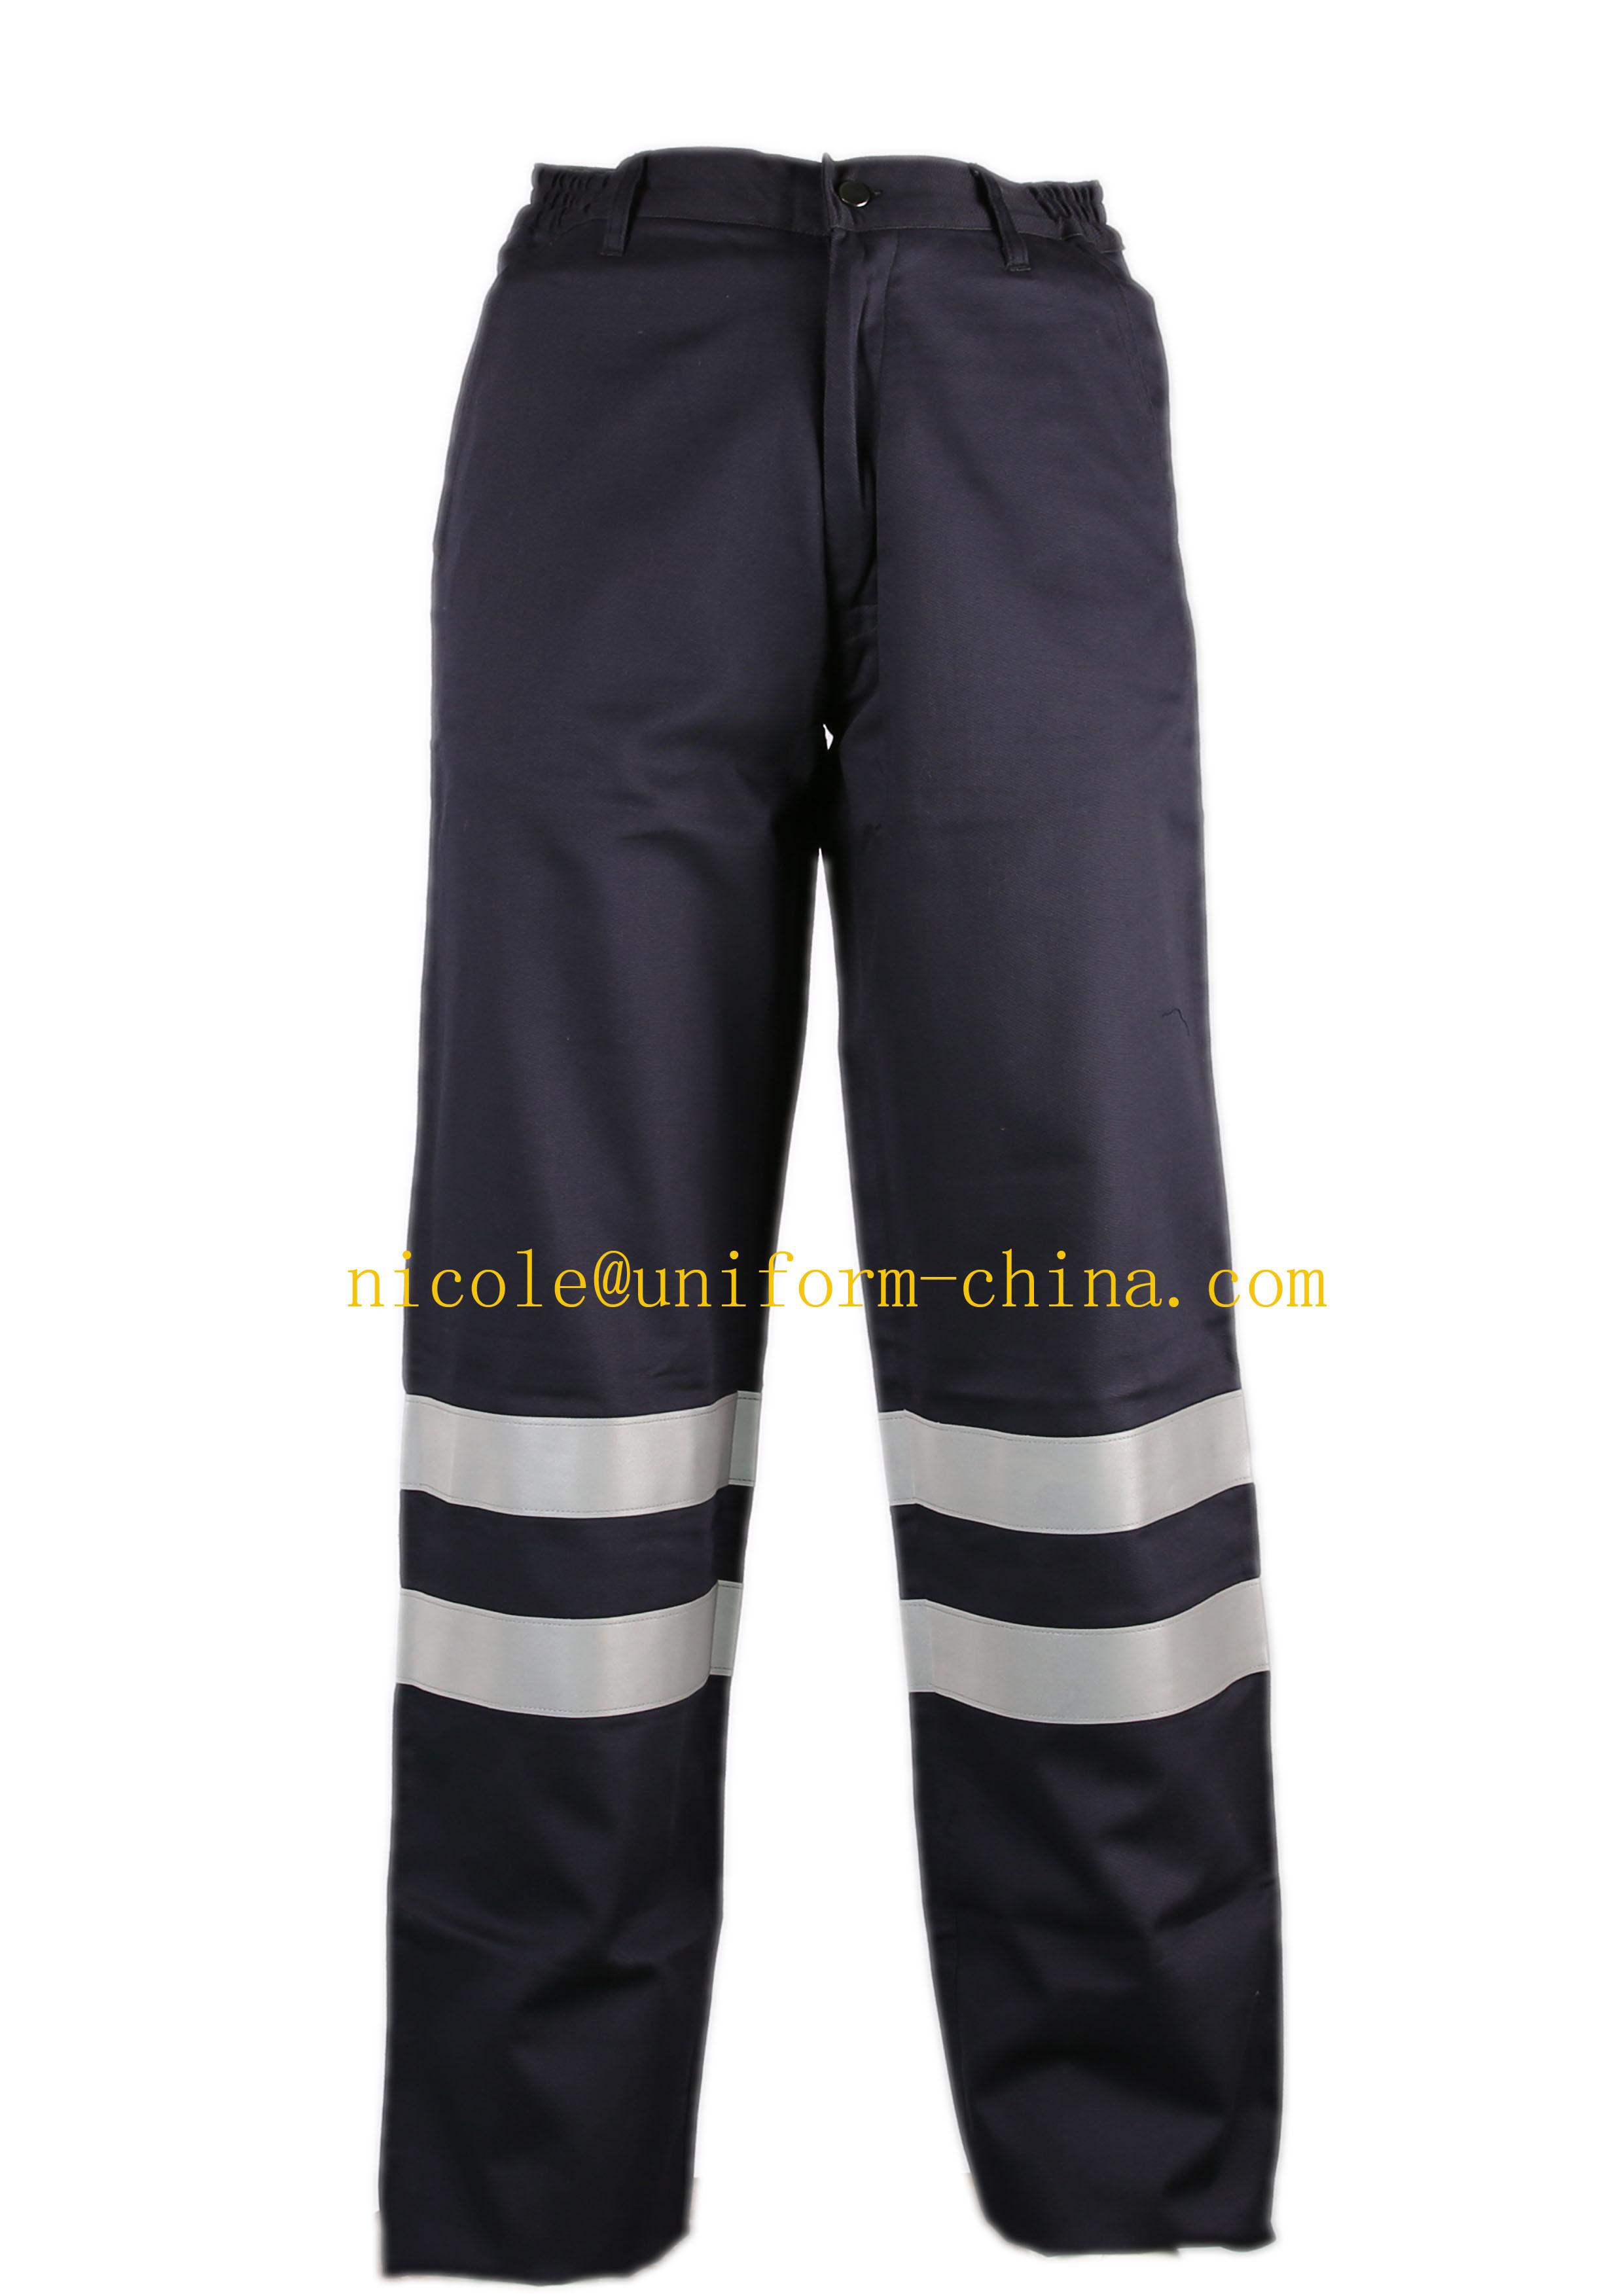 En11611 and En11612 Flame Retardant Mens Navy Refelctive Safety Work Cargo Pants